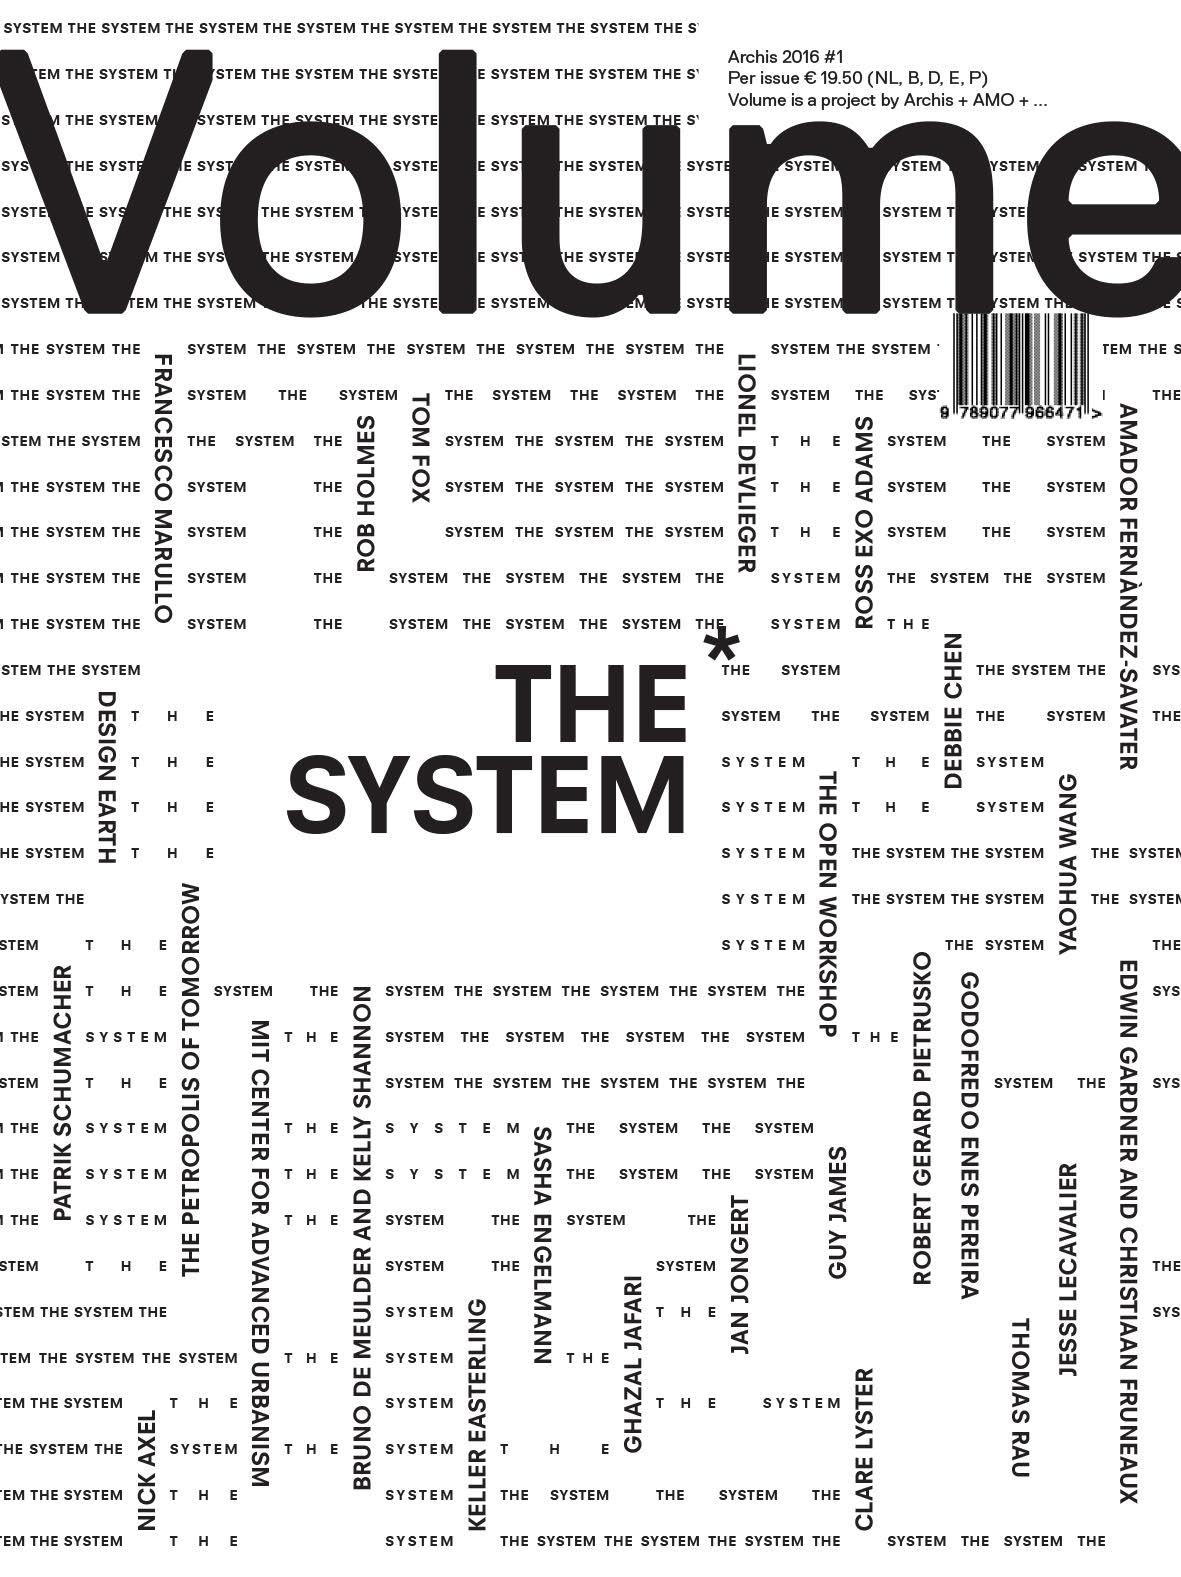 Volume_RewiringTerritories.jpg